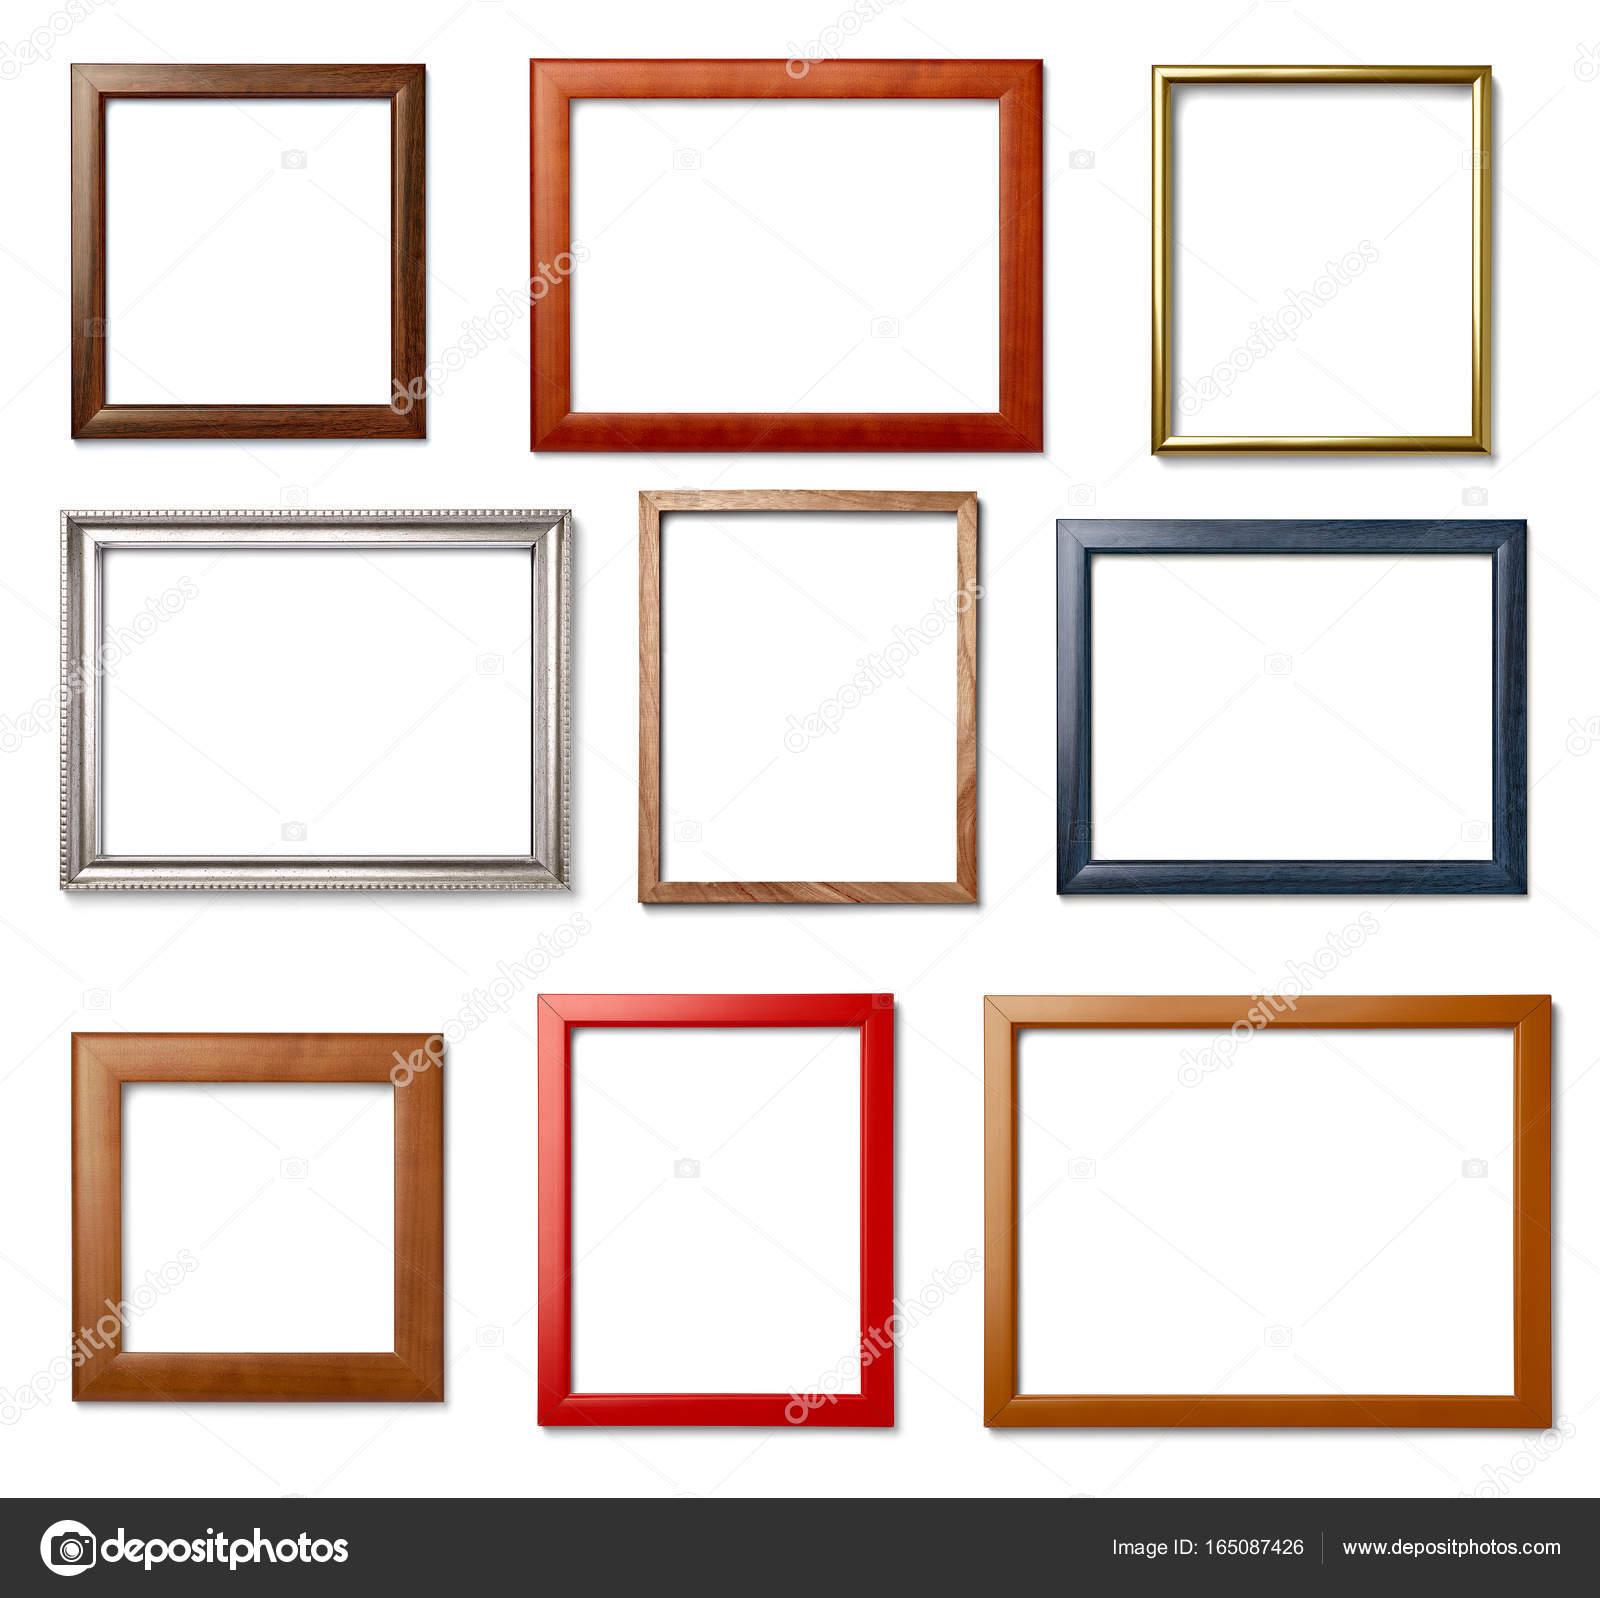 Vintage-Rahmen Holz Hintergrundbild — Stockfoto © PicsFive #165087426